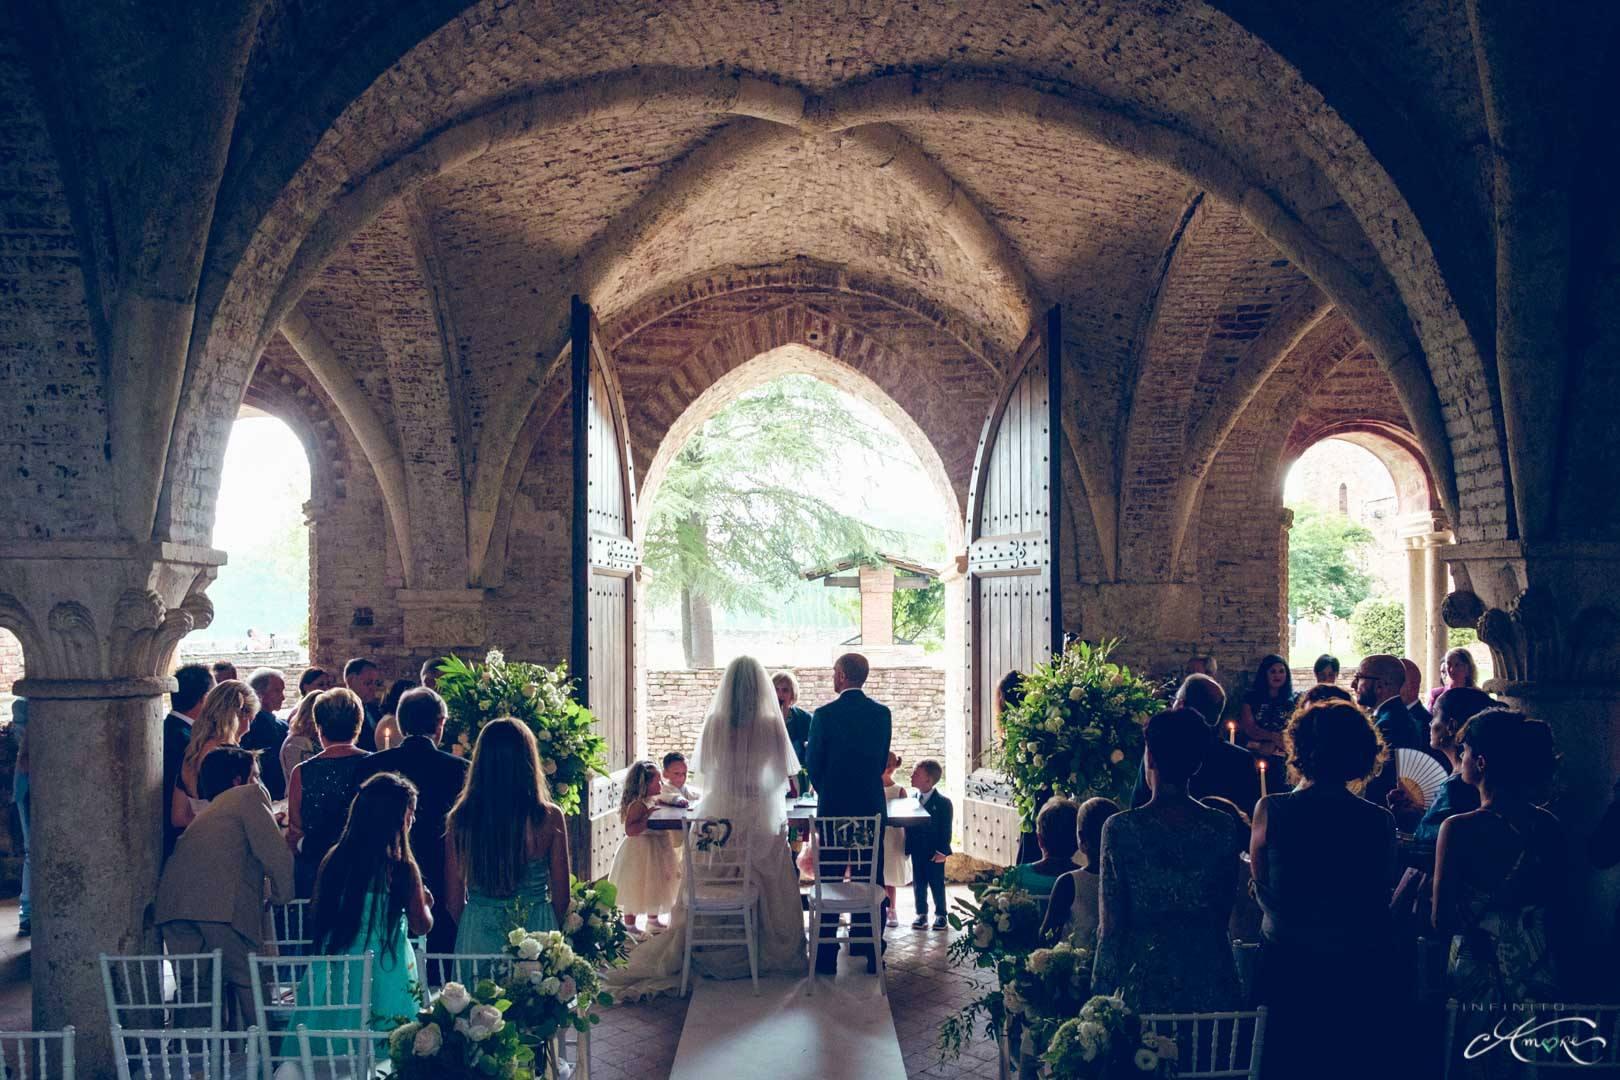 Infinito Amore Wedding Design